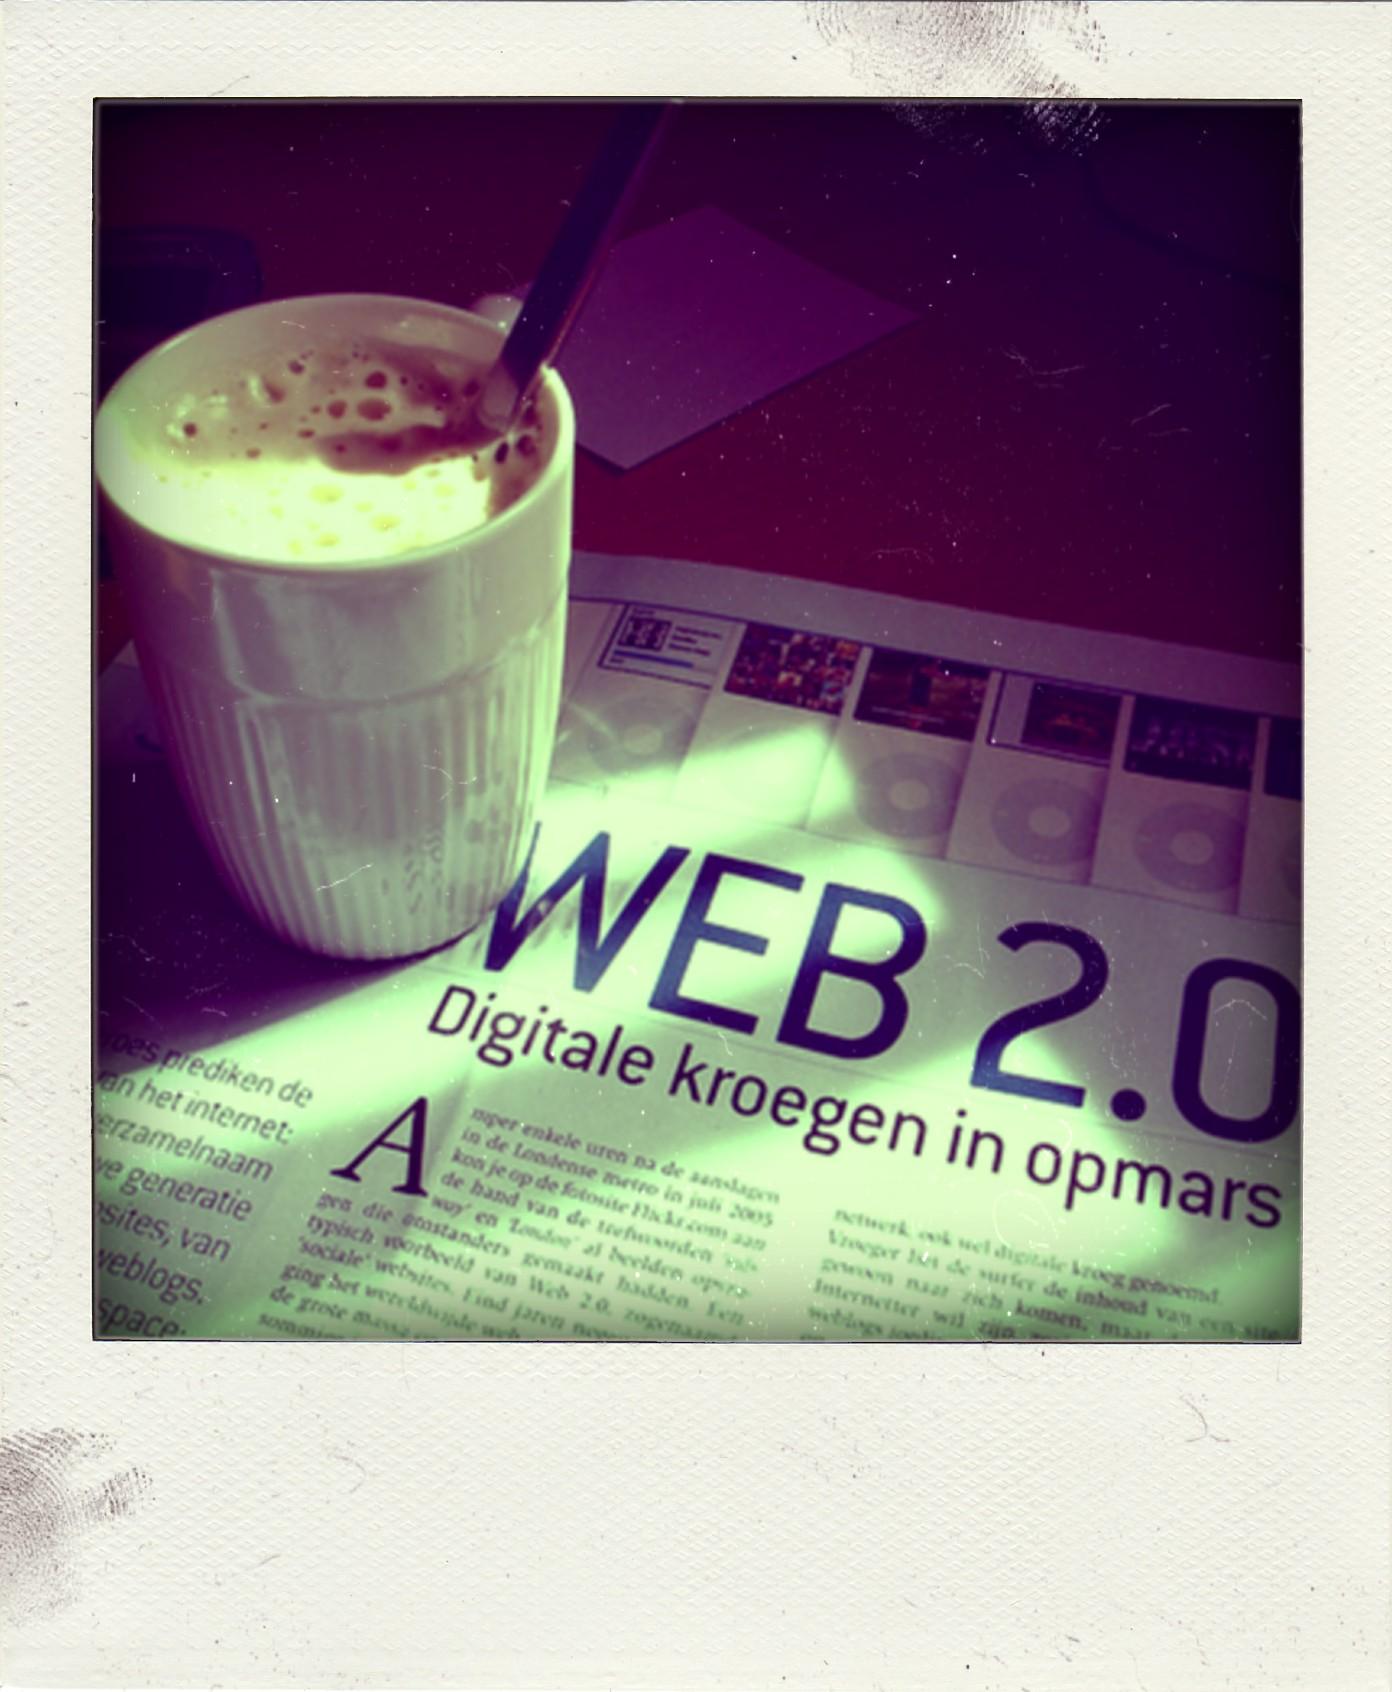 web2.0-pola